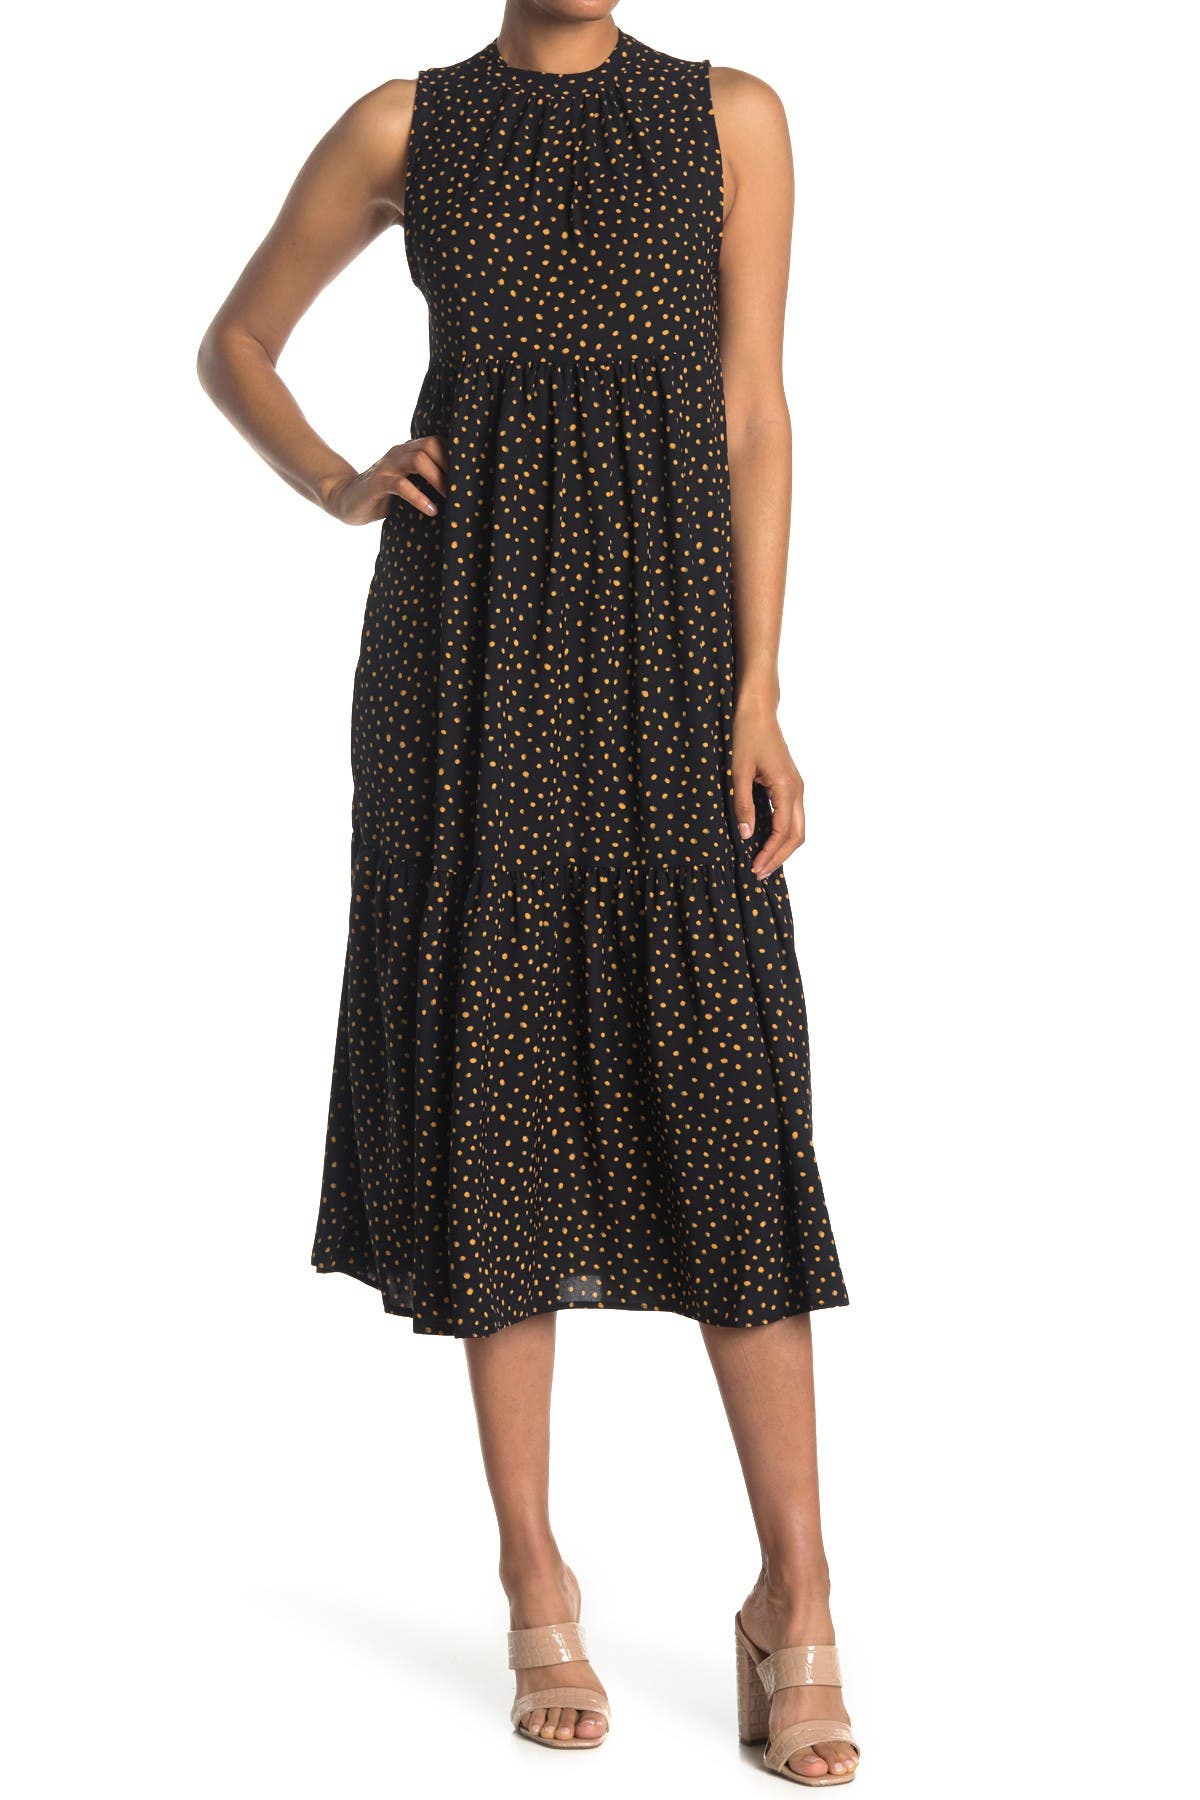 Image of Velvet Torch Sleeveless Tiered Maxi Dress